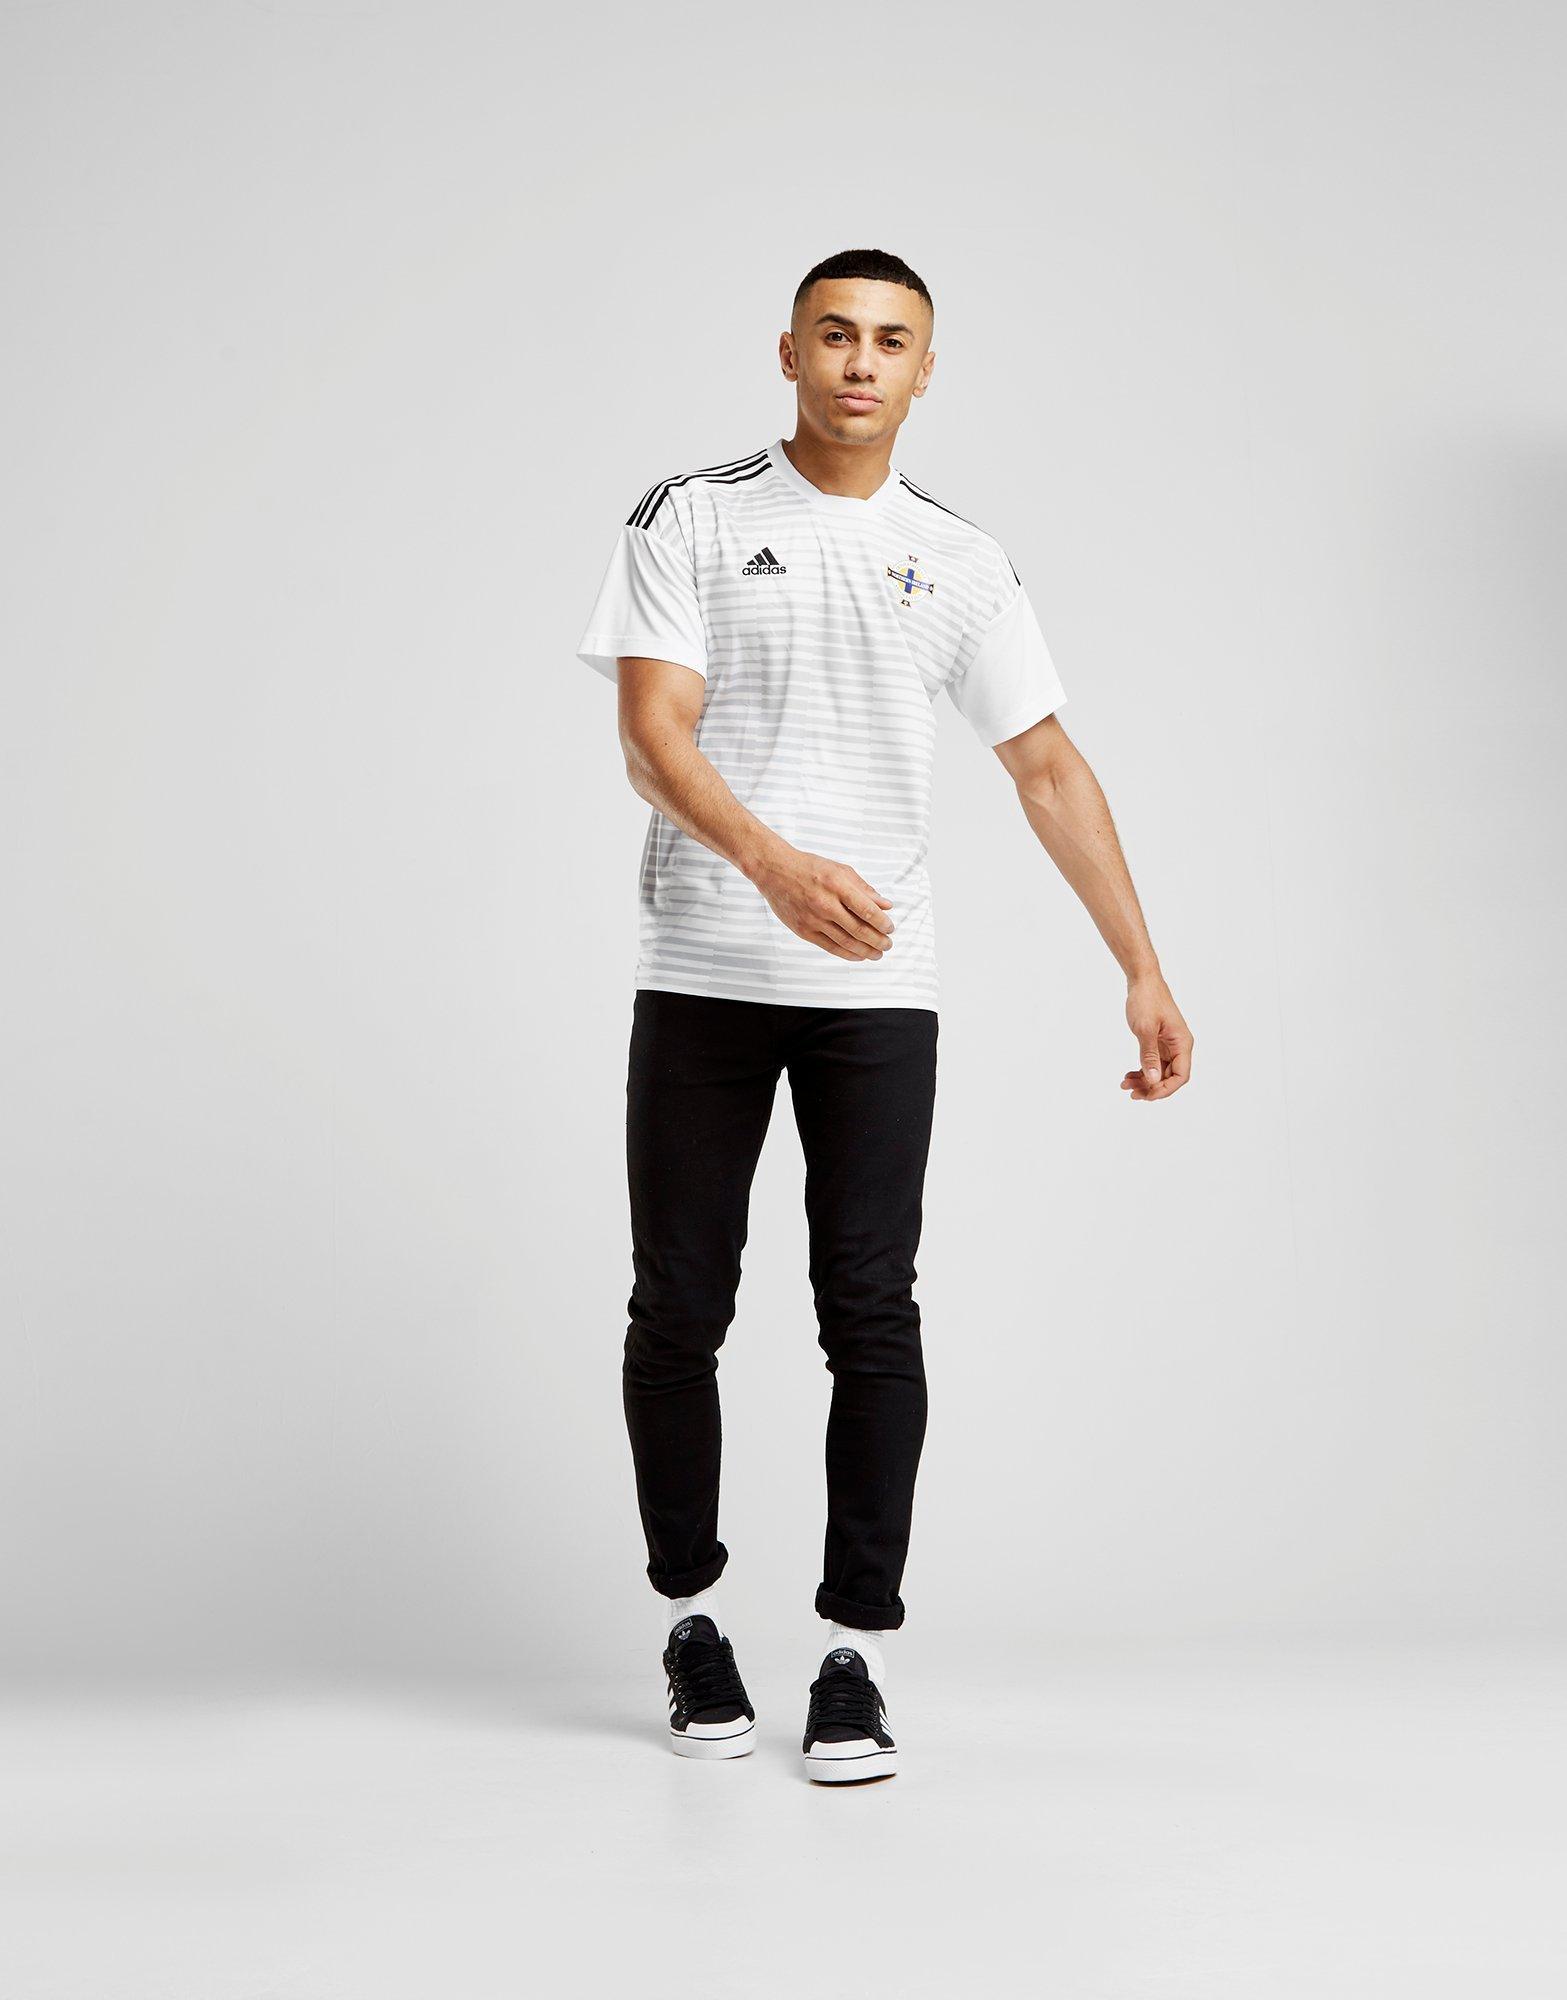 adidas Northern Ireland 2018/19 Pre-Match Shirt